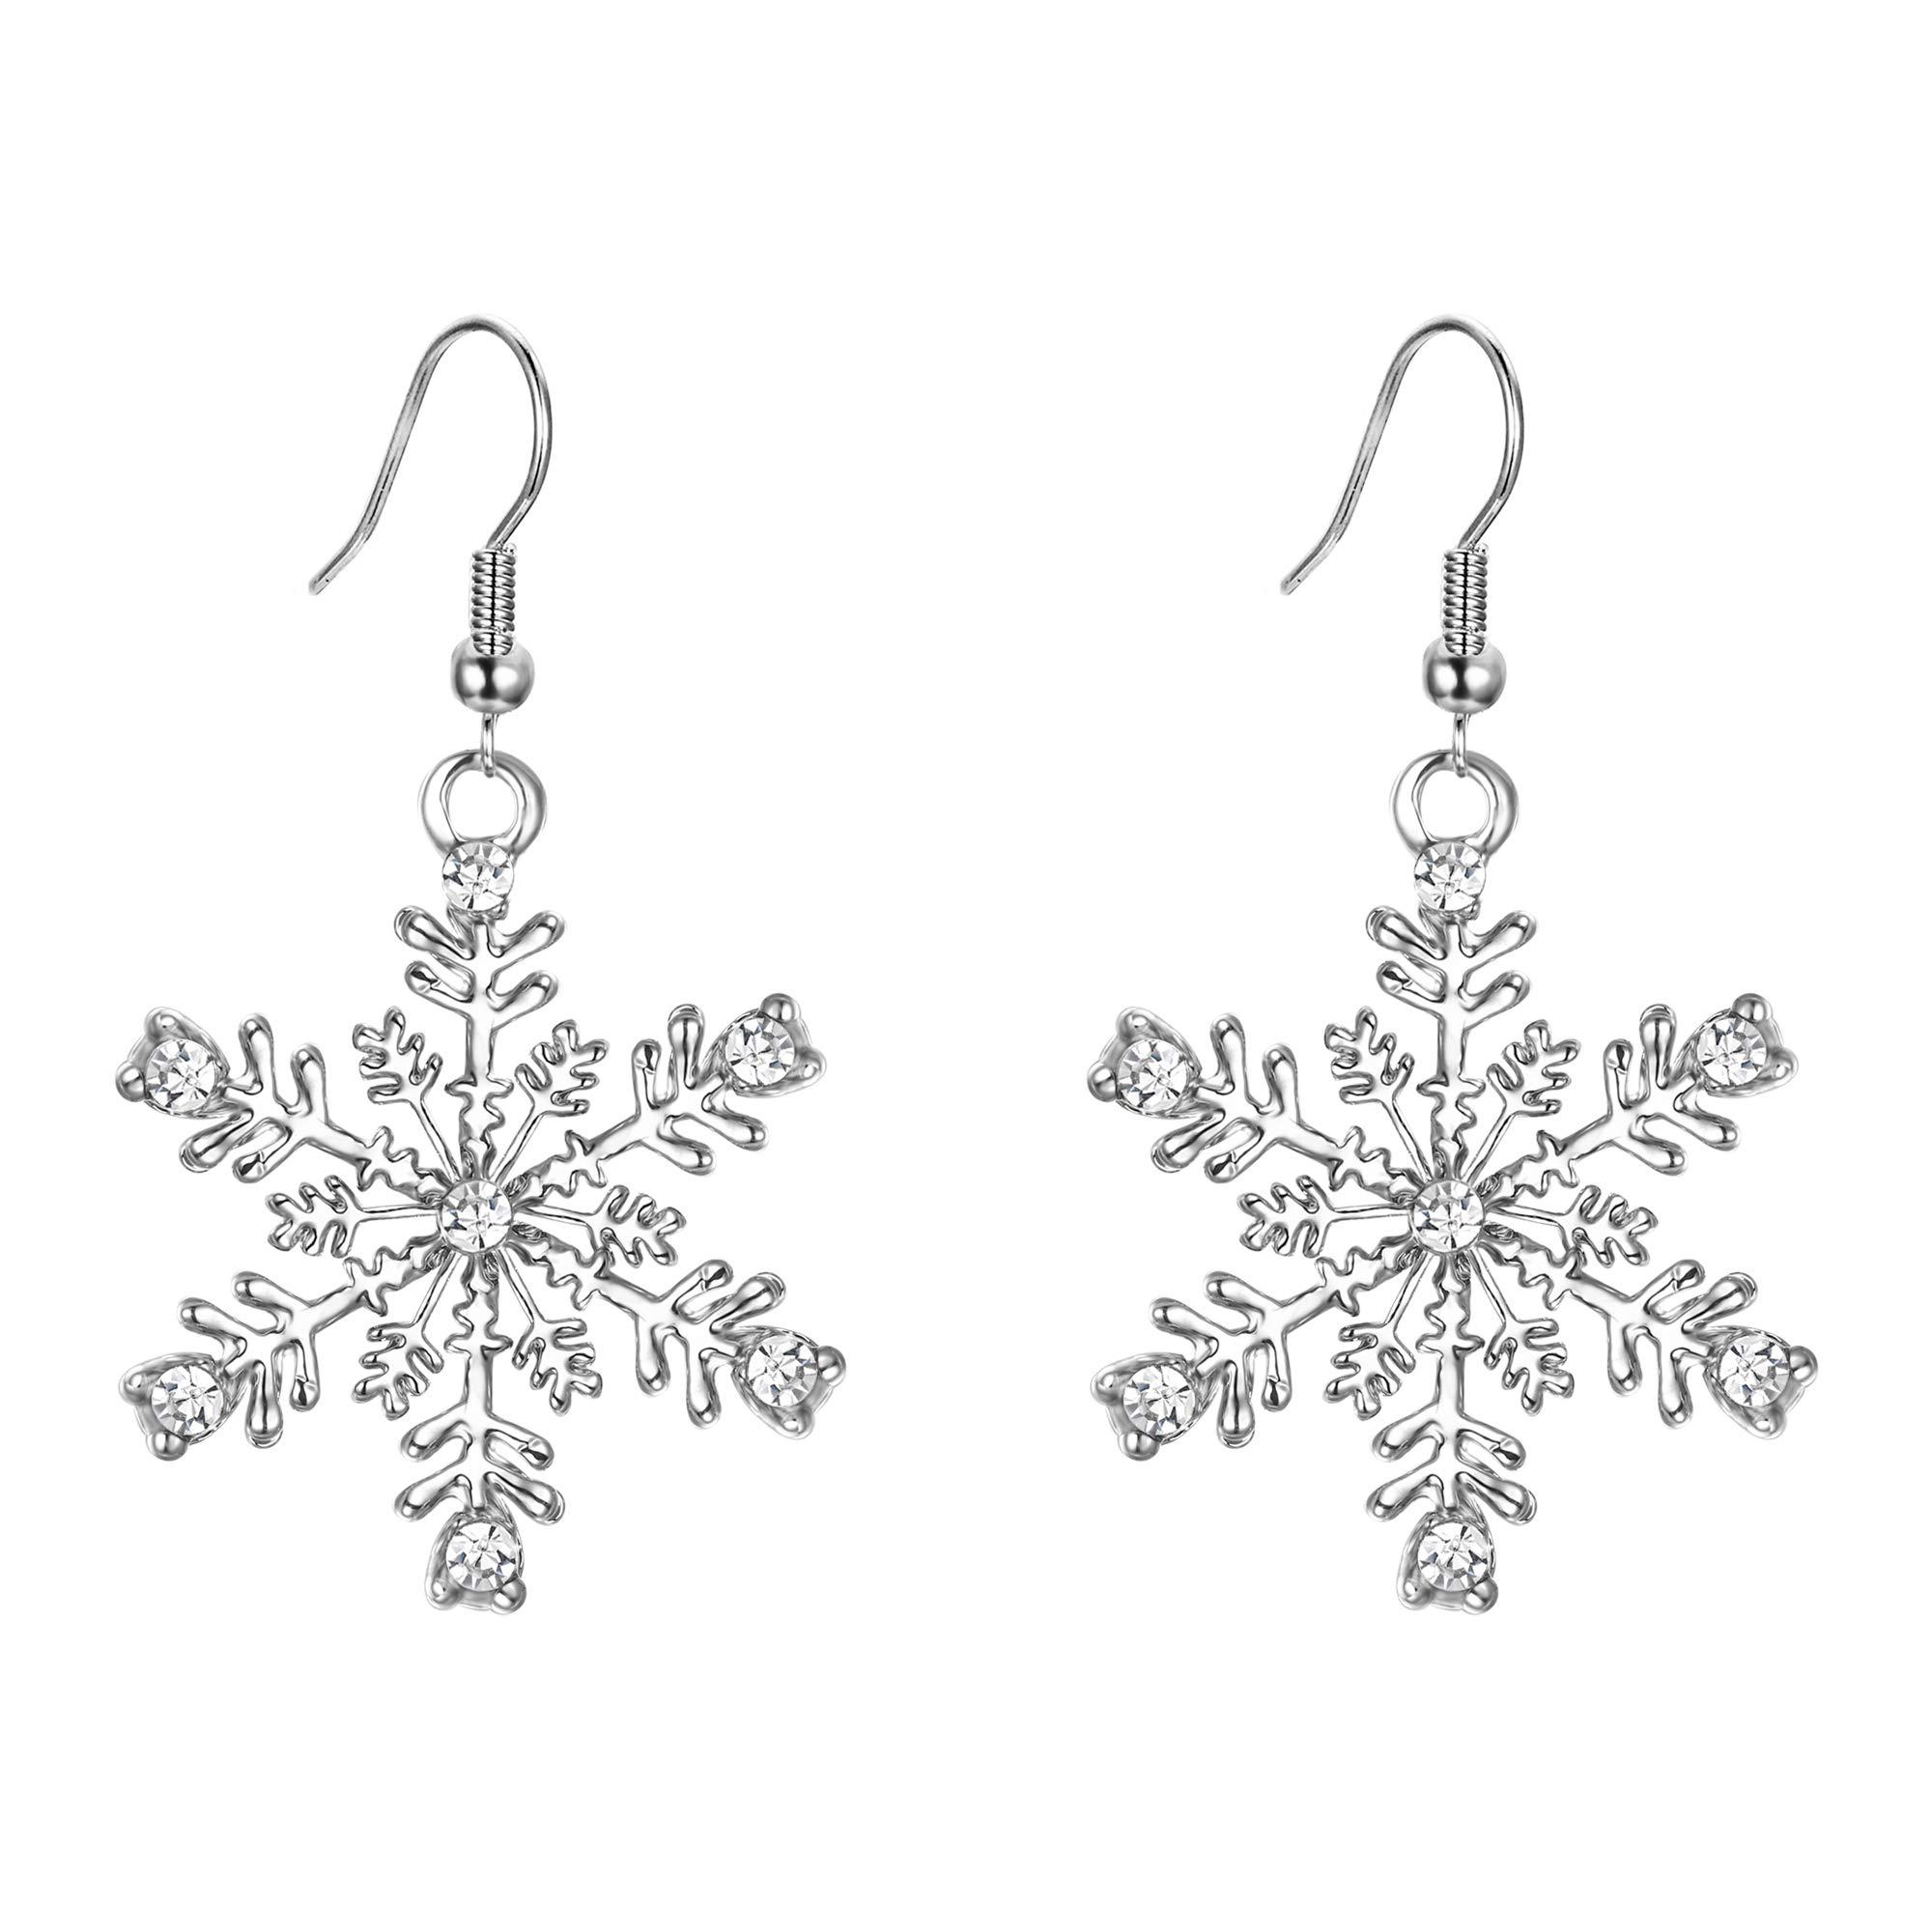 8078e3d2c EVER FAITH Austrian Crystal Winter Party Snowflake Pierced Hook Dangle  Earrings Clear - Christmas Countdown Live